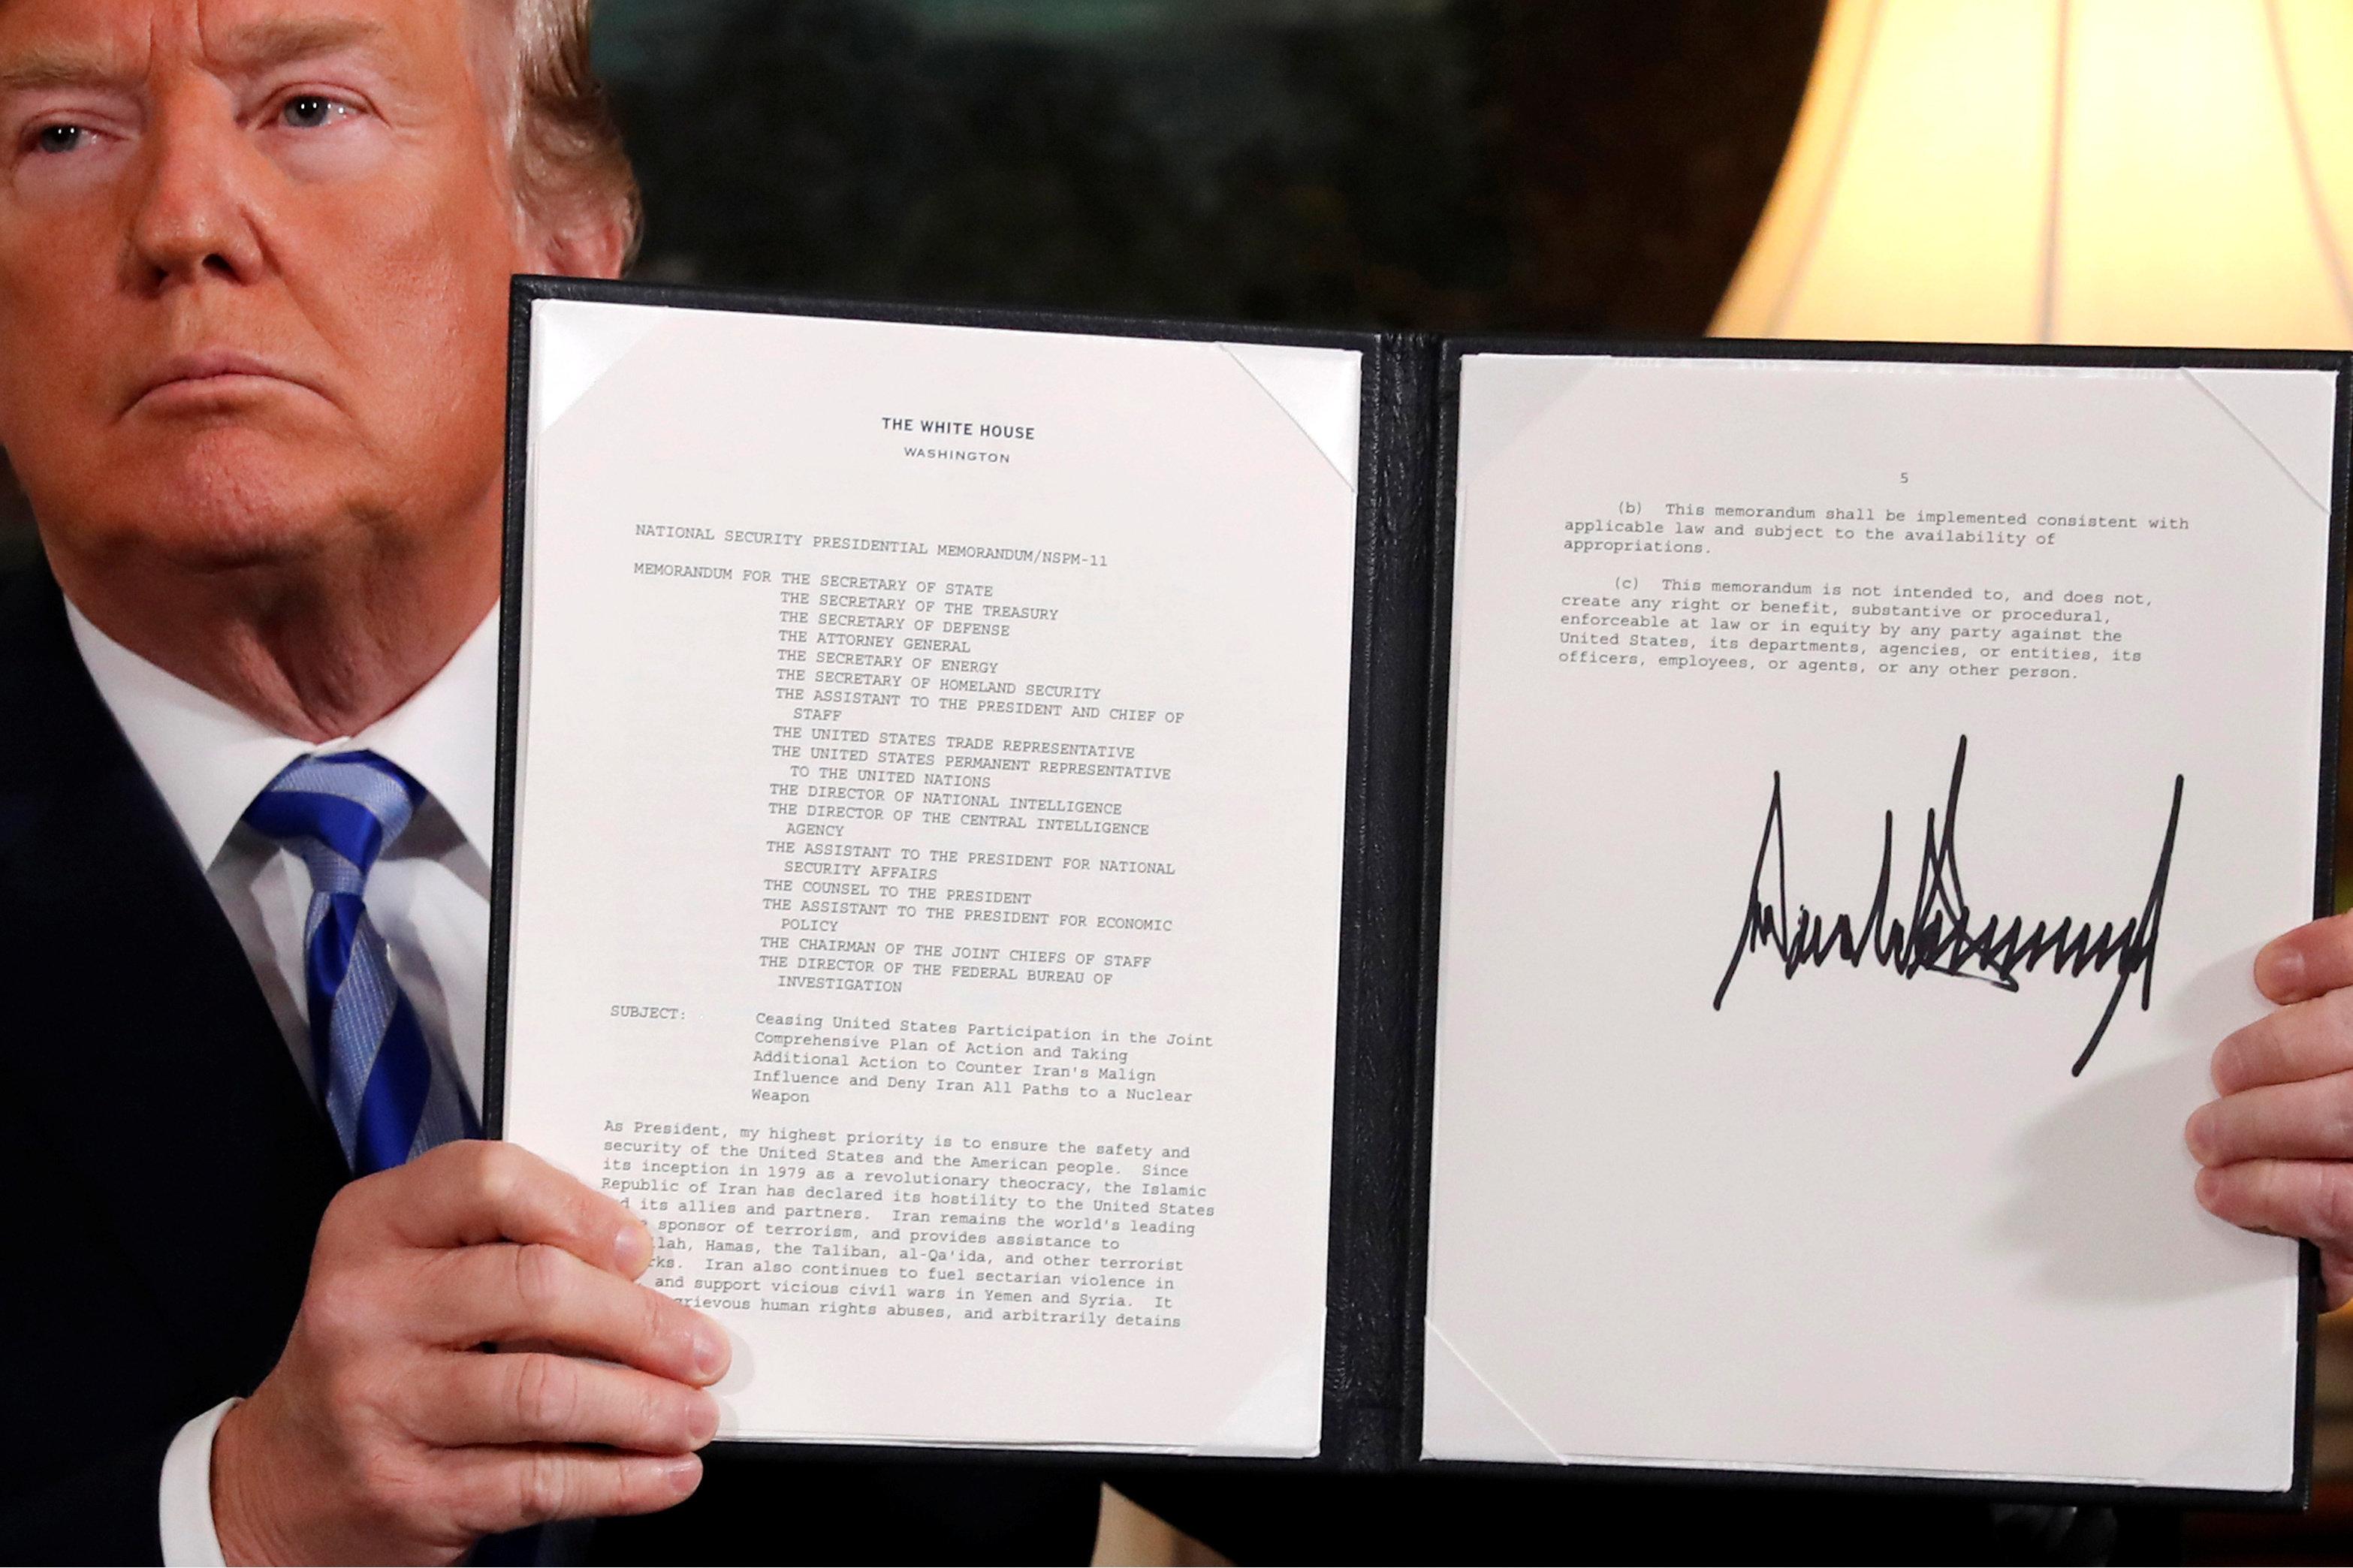 Iran : Rohani prêt à rester dans l'accord si l'Europe apporte des garanties